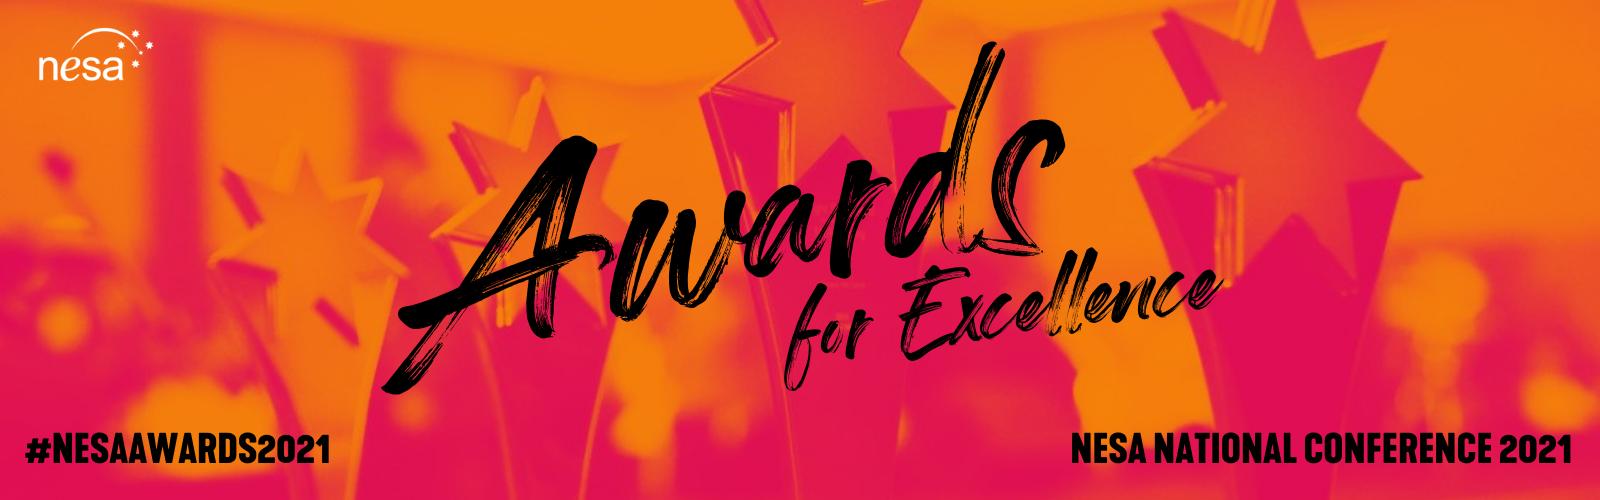 NESA Awards for Excellence 2021 Website Banner Image - Home | National Employment Services Association - NESA